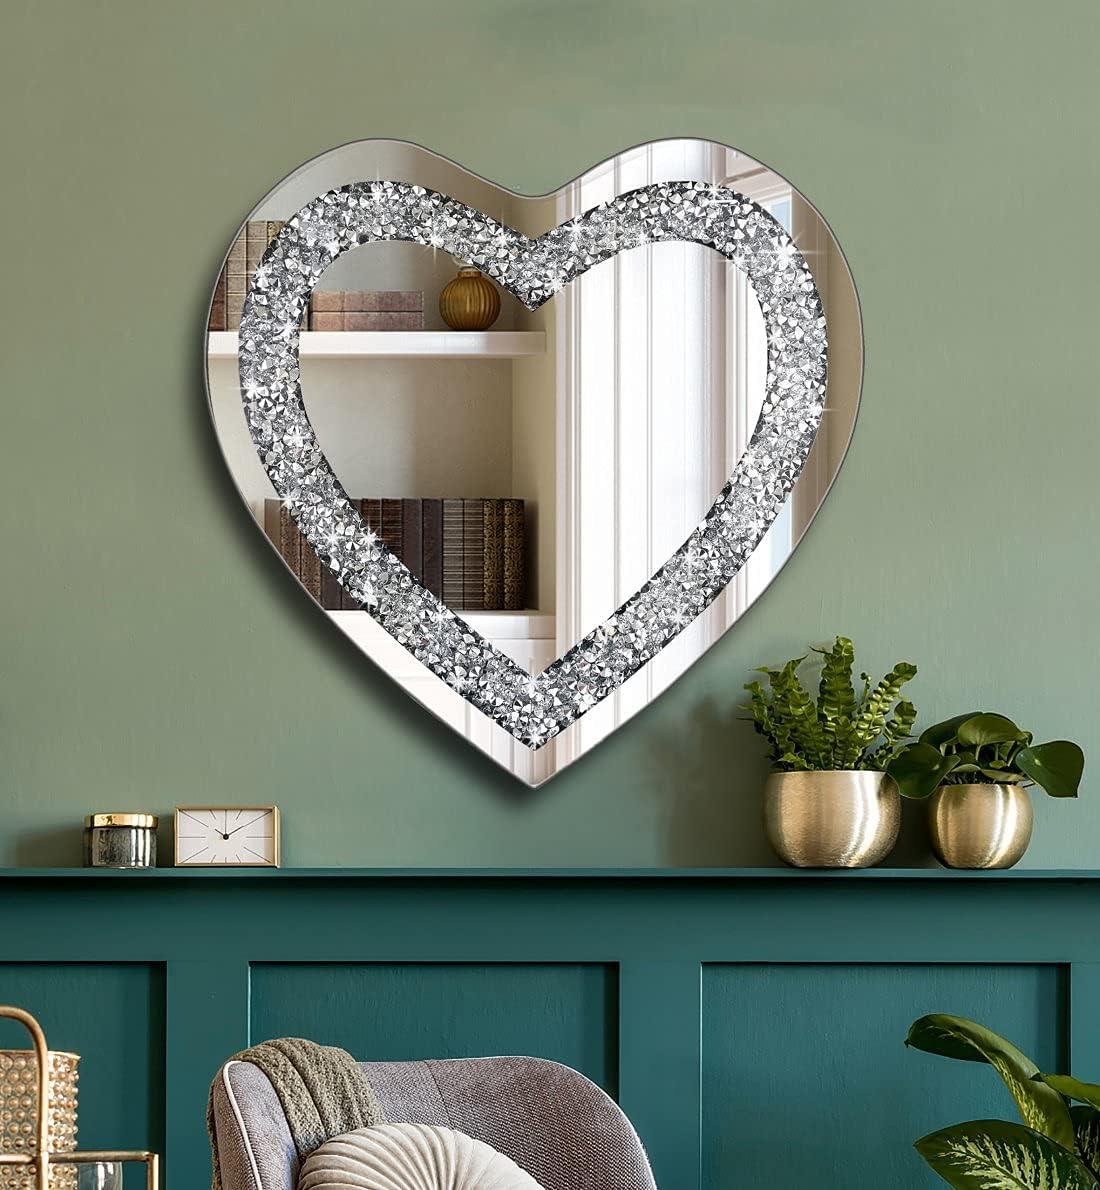 Crystal Crush Diamond Heart Shaped Silver Mirror for Wall Decoration 20x20x1 inch Wall Hang Frameless Mirror Acrylic Diamond Décor.